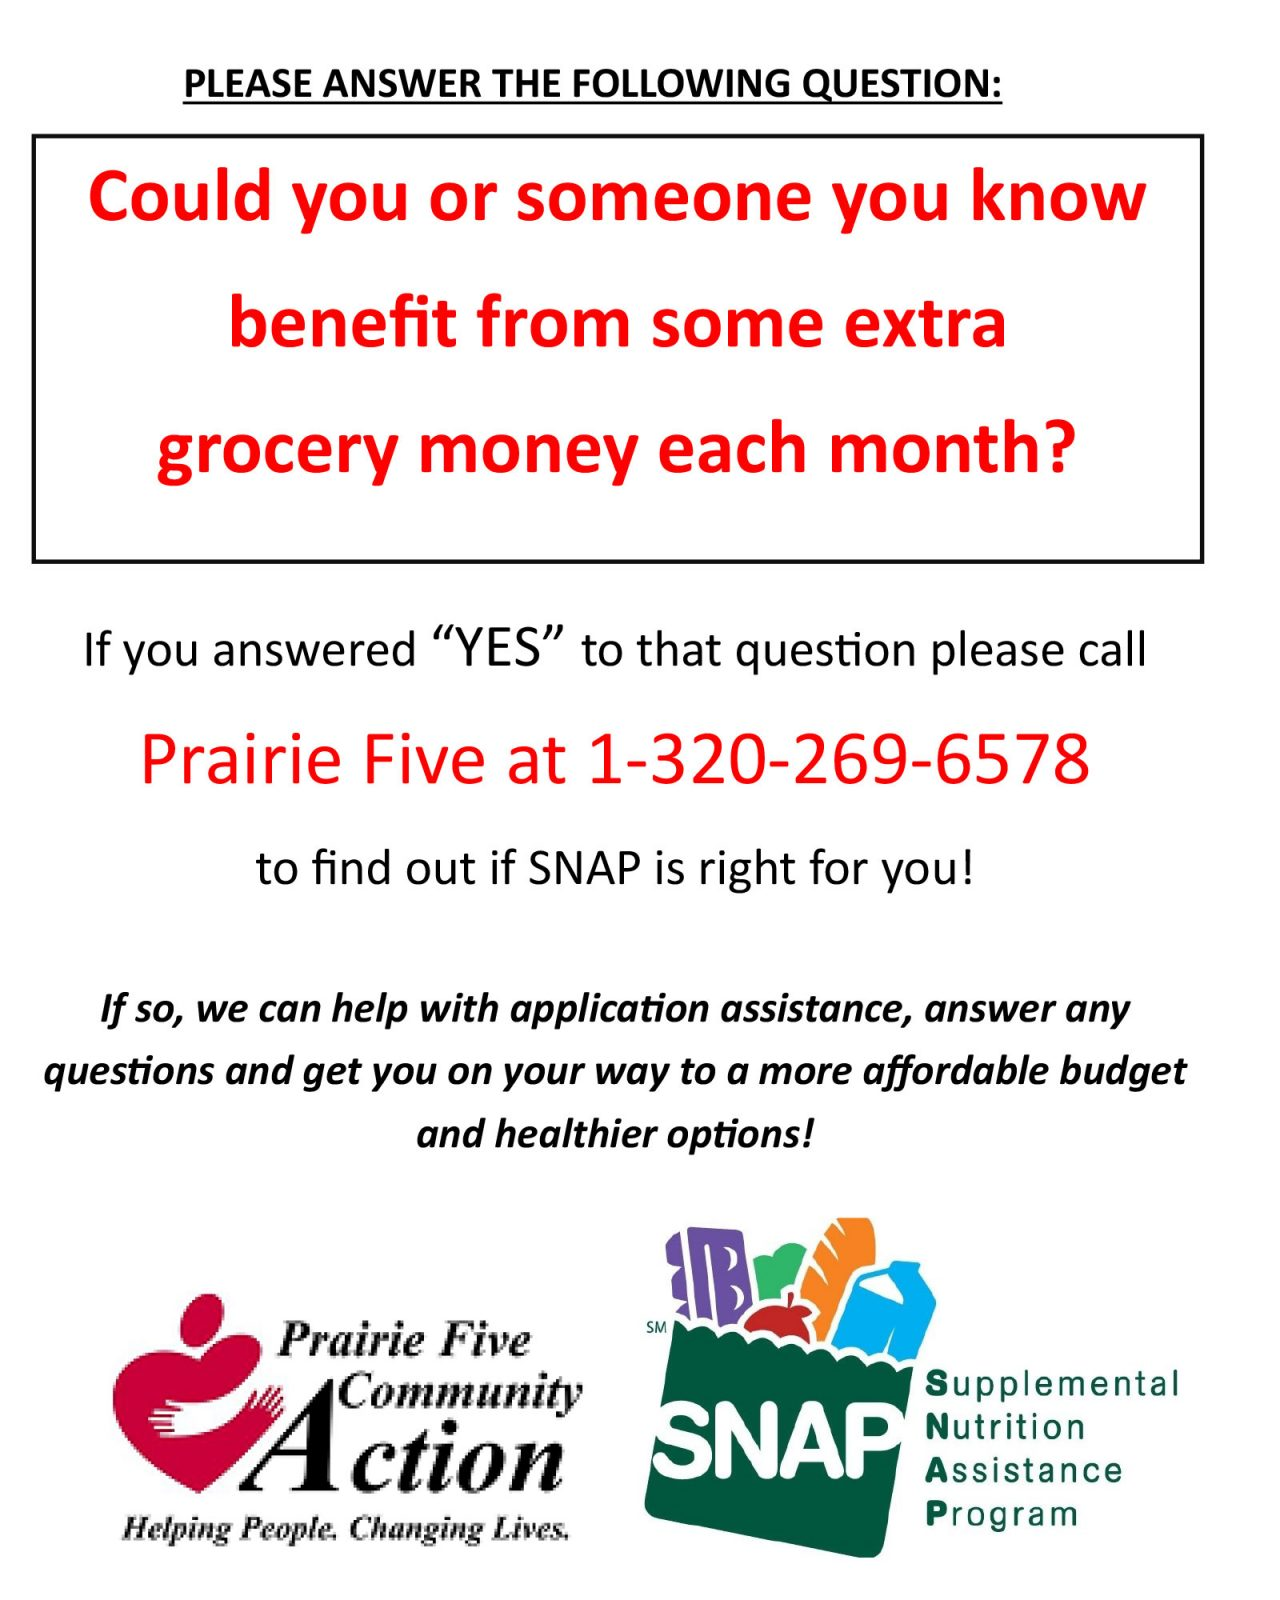 SNAP Flyer - Call 1-320-269-6578